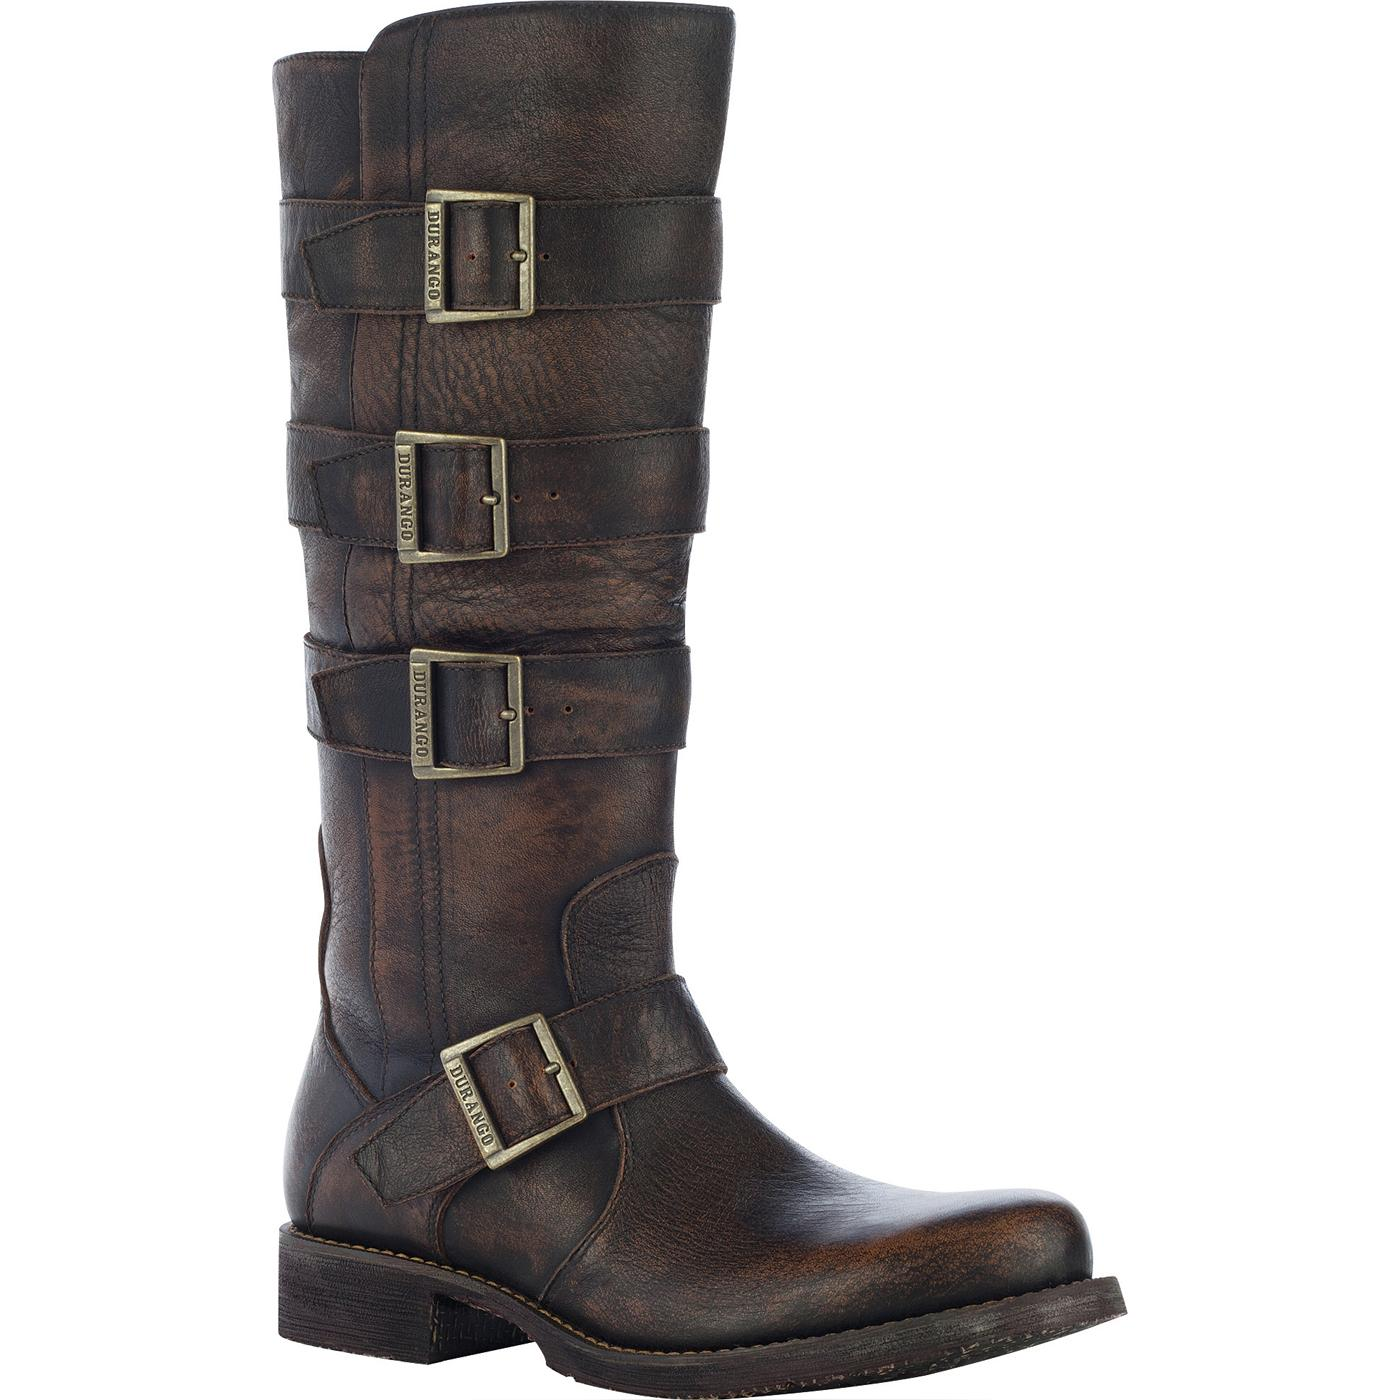 engineer boots durango city womenu0027s savannah engineer boot, brown, large odhnual